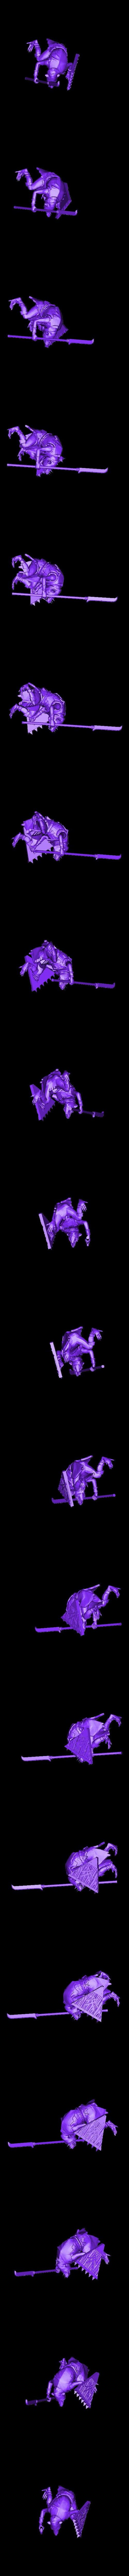 Clanrat_Spear_1.stl Download free 3MF file Gangsta Rats • 3D printer template, EmanG